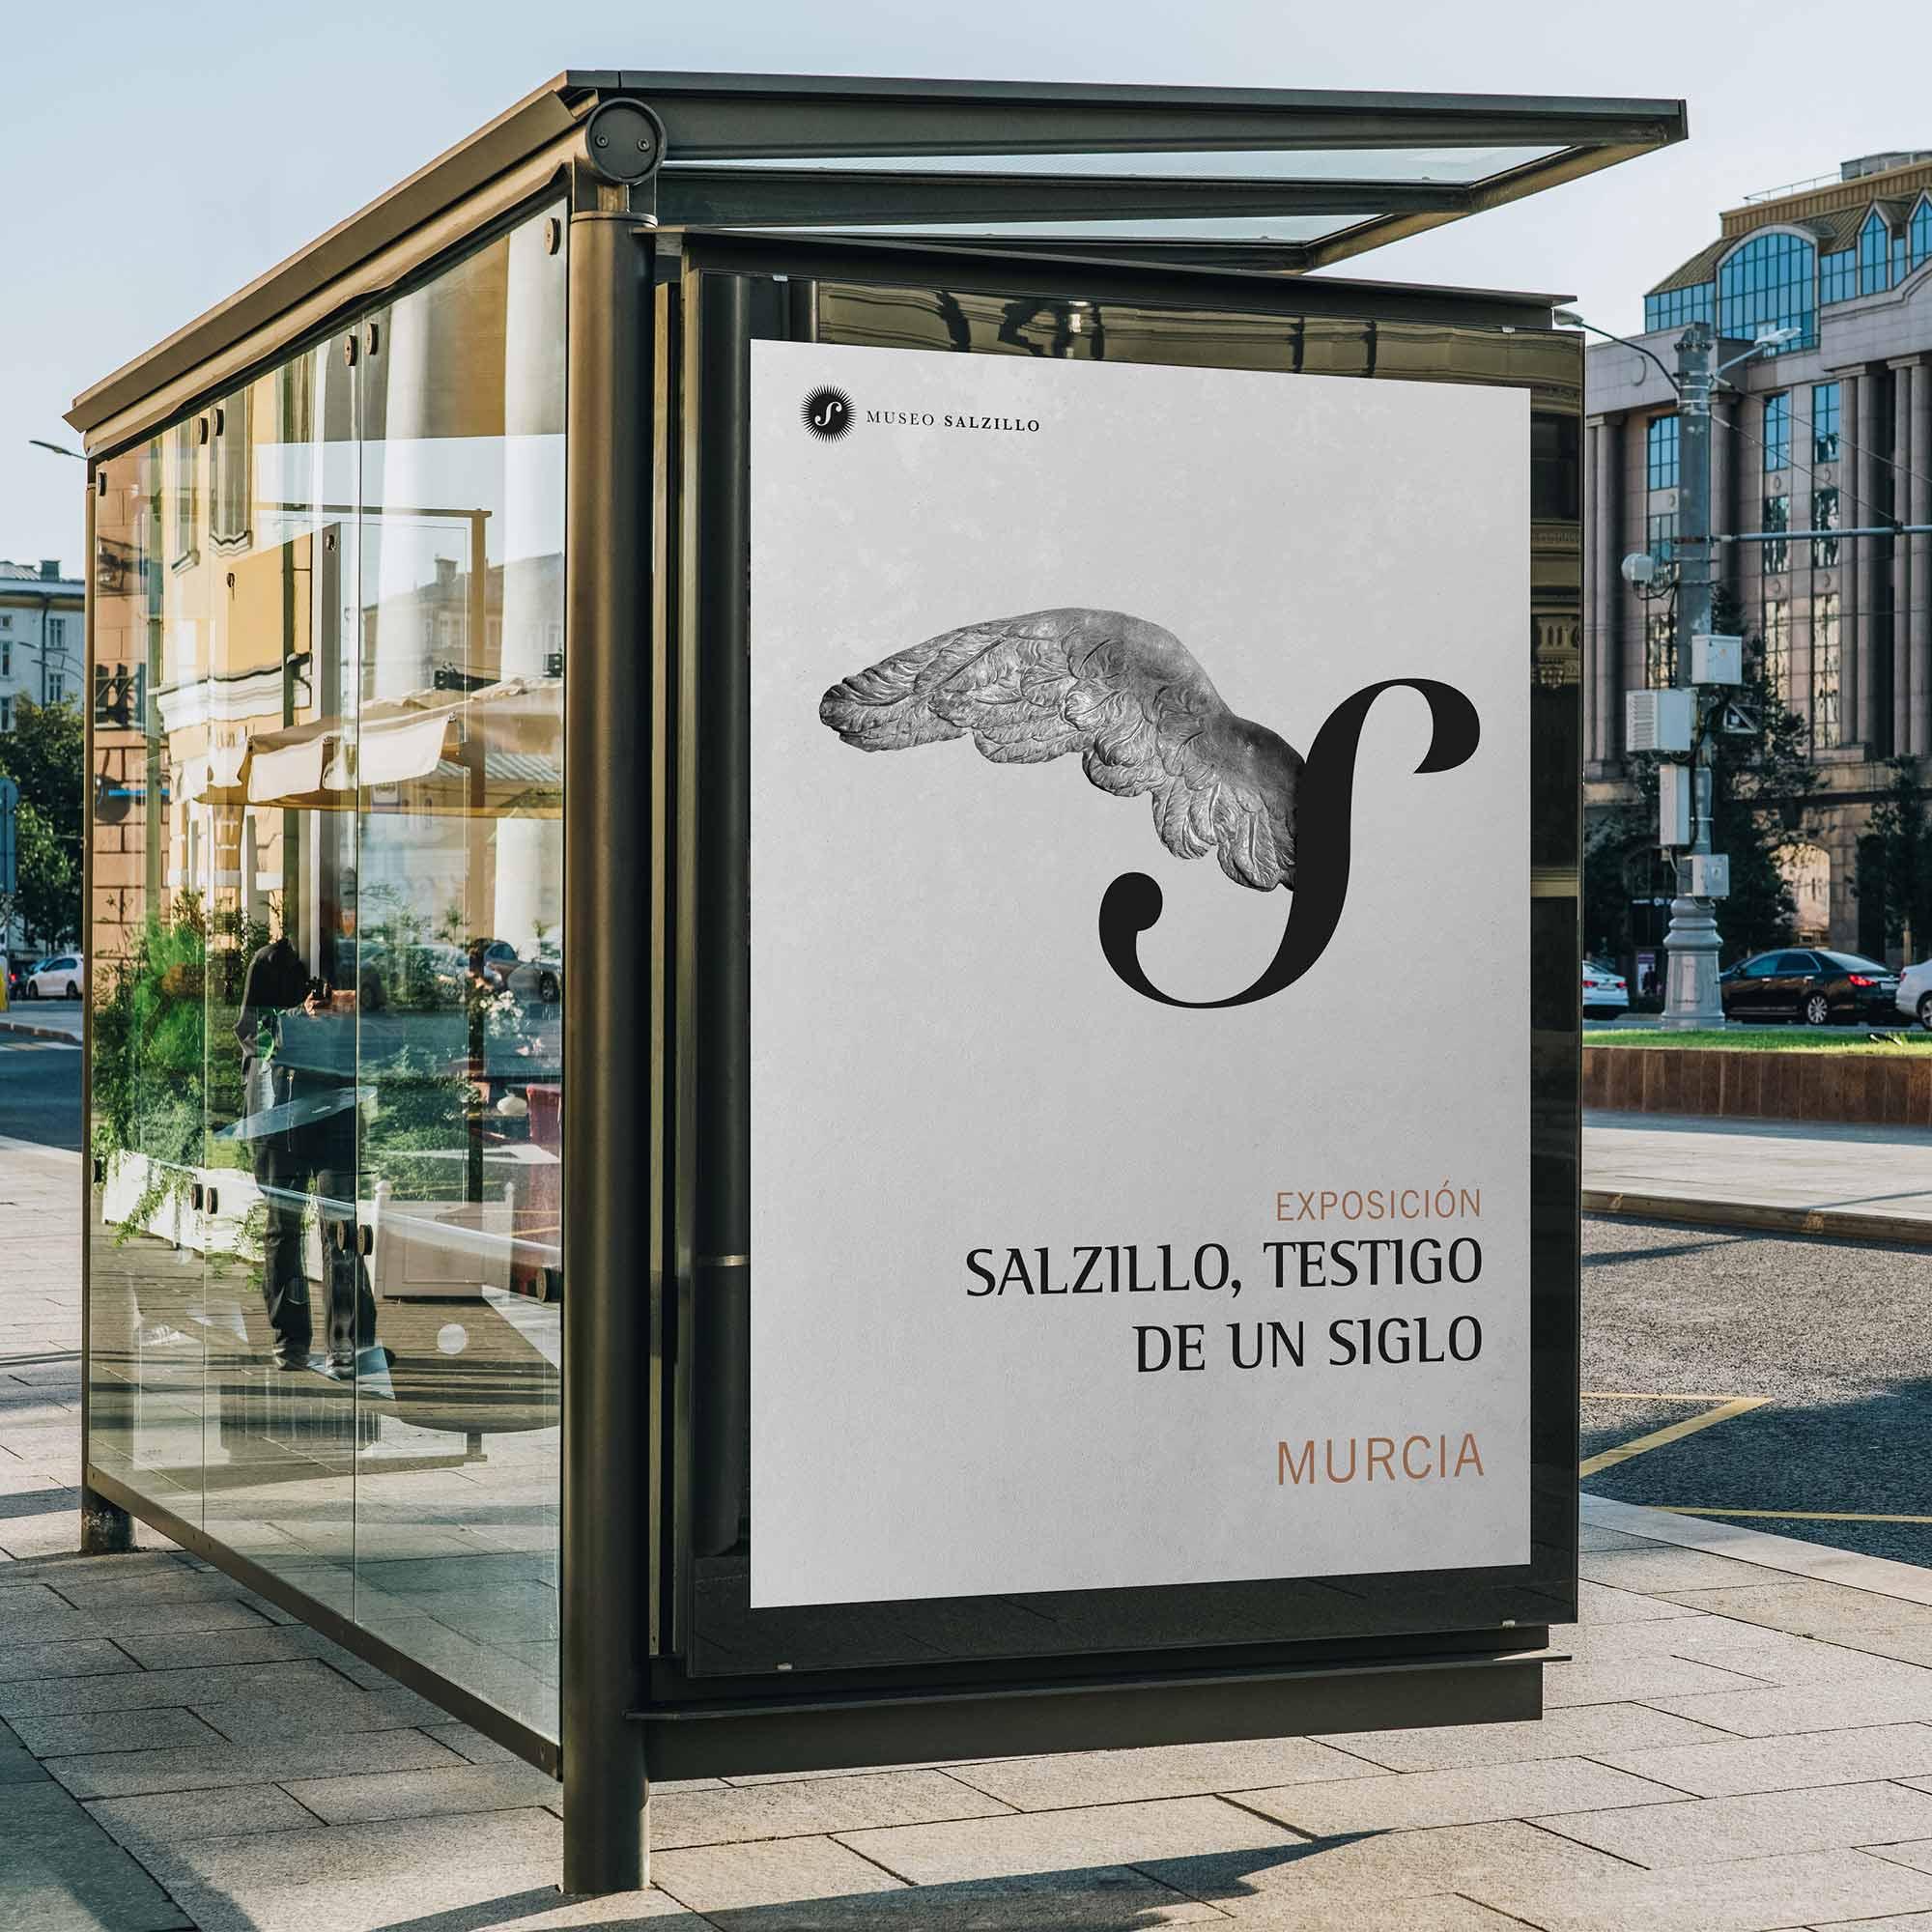 Museo-salzillo-branding-06